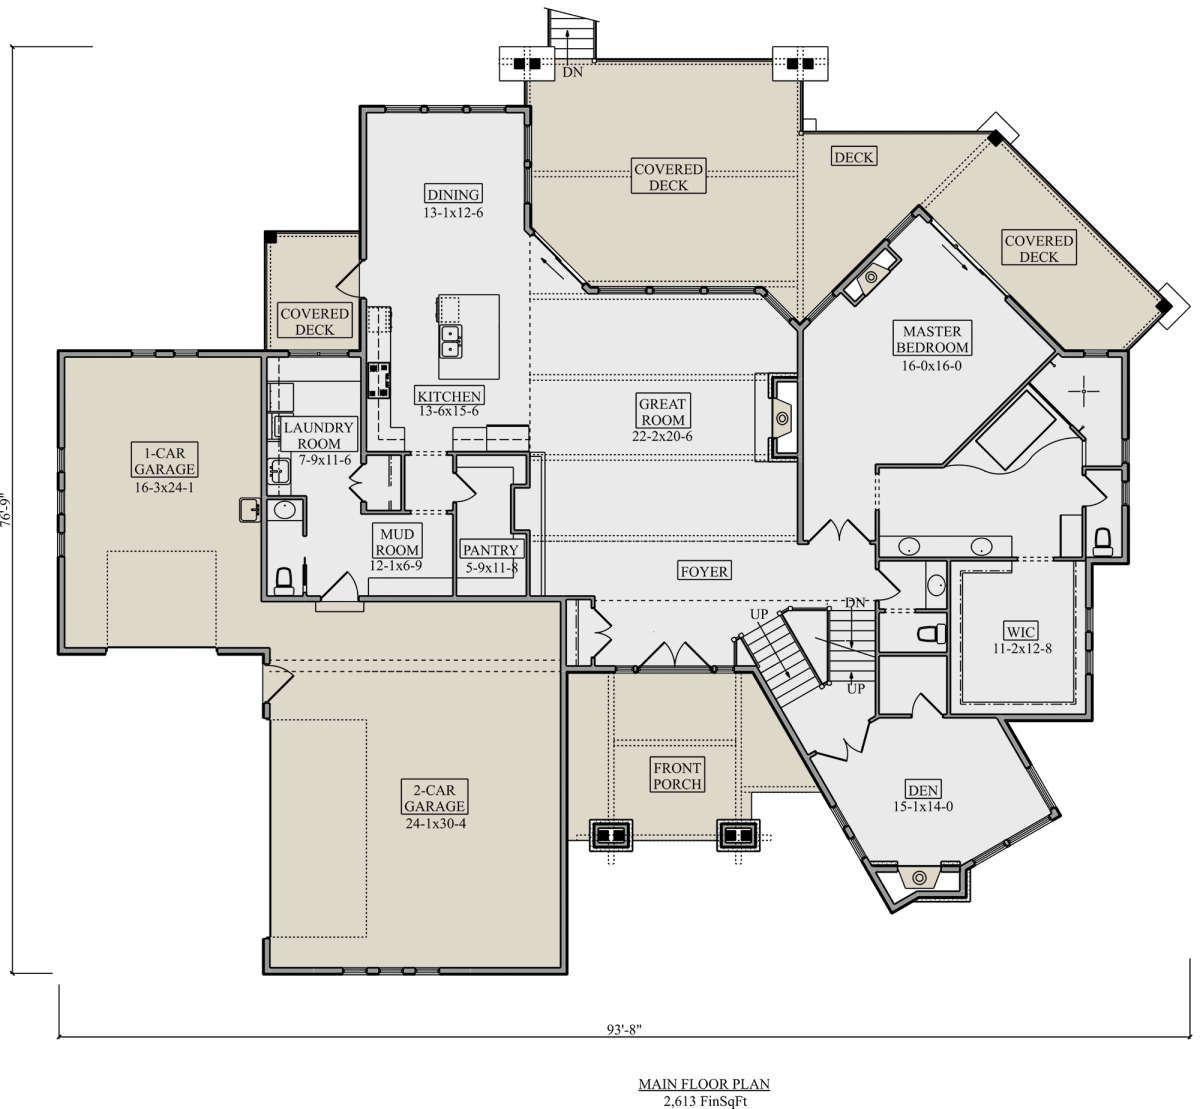 House Plan 5631 00107 Contemporary Plan 3 587 Square Feet 3 Bedrooms 4 Bathrooms Rustic House Plans Contemporary House Plans House Plans